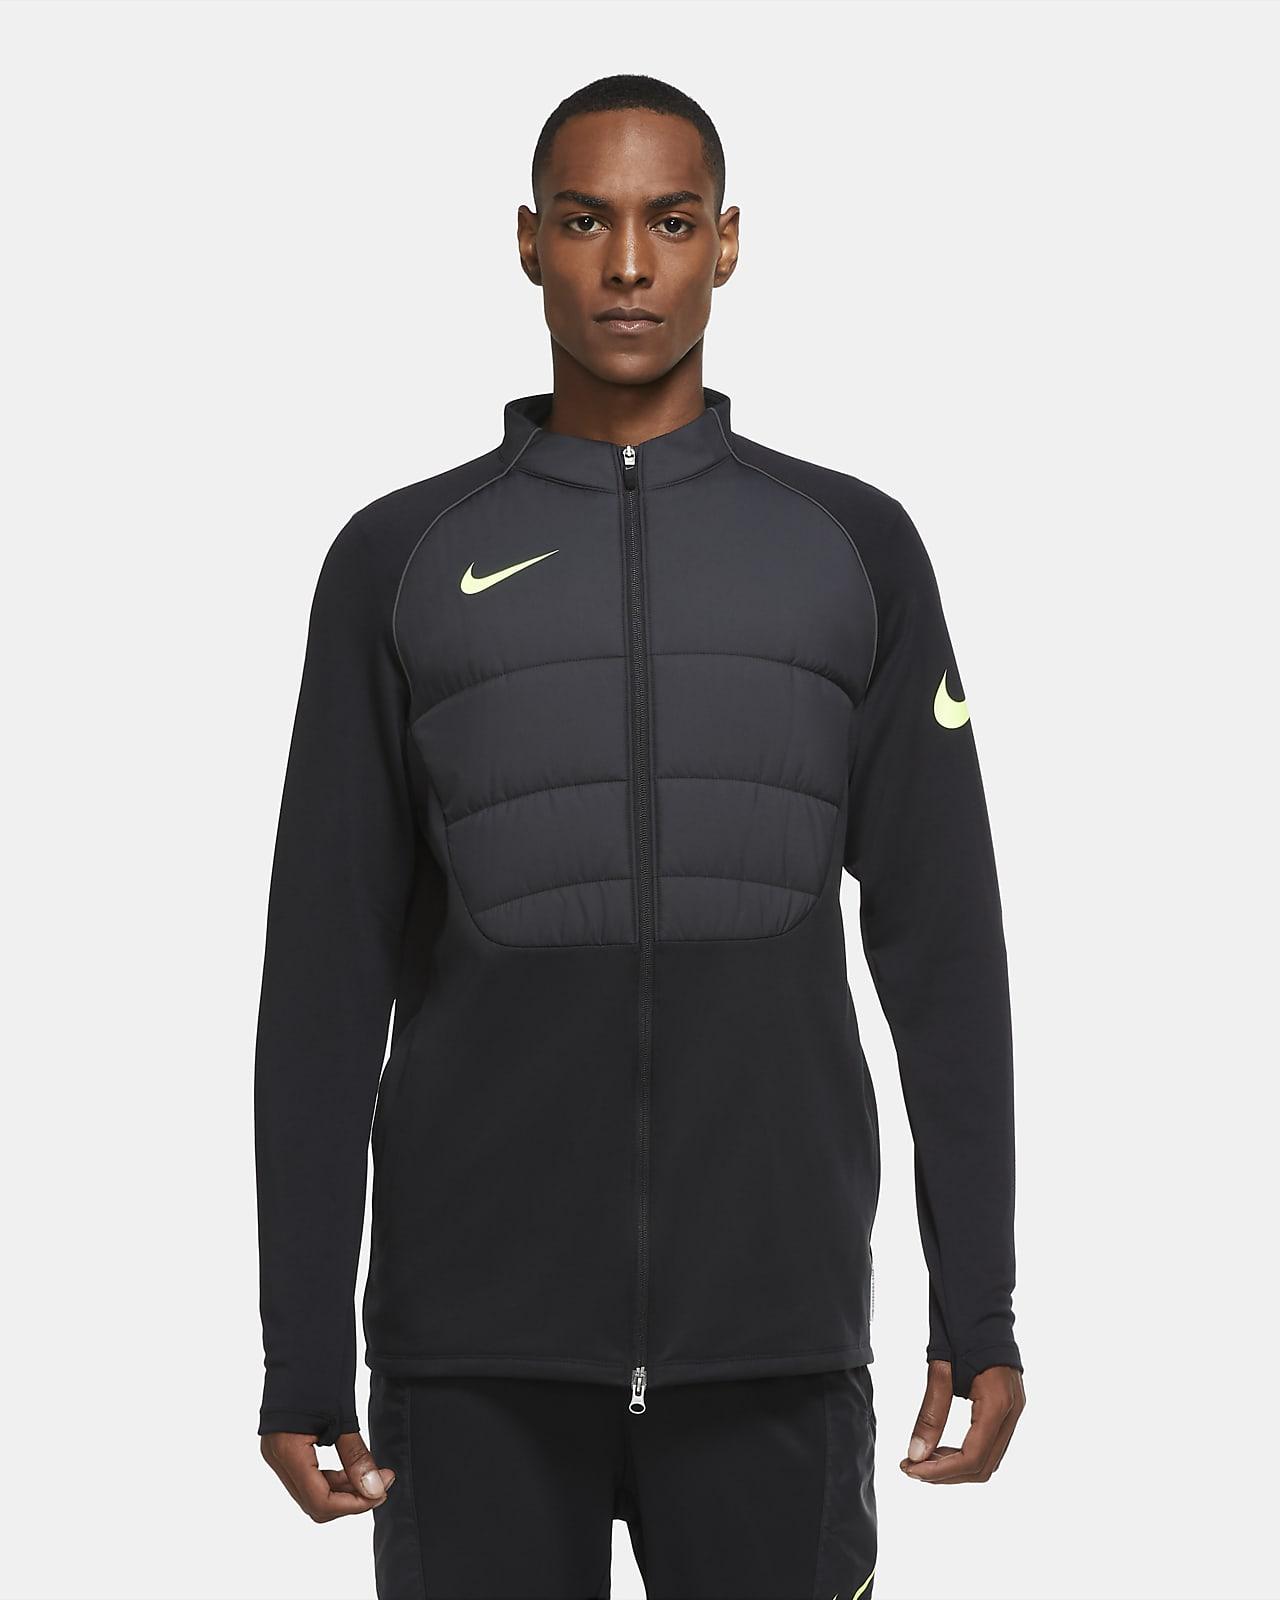 Nike Therma Strike Winter Warrior Men's Football Drill Jacket